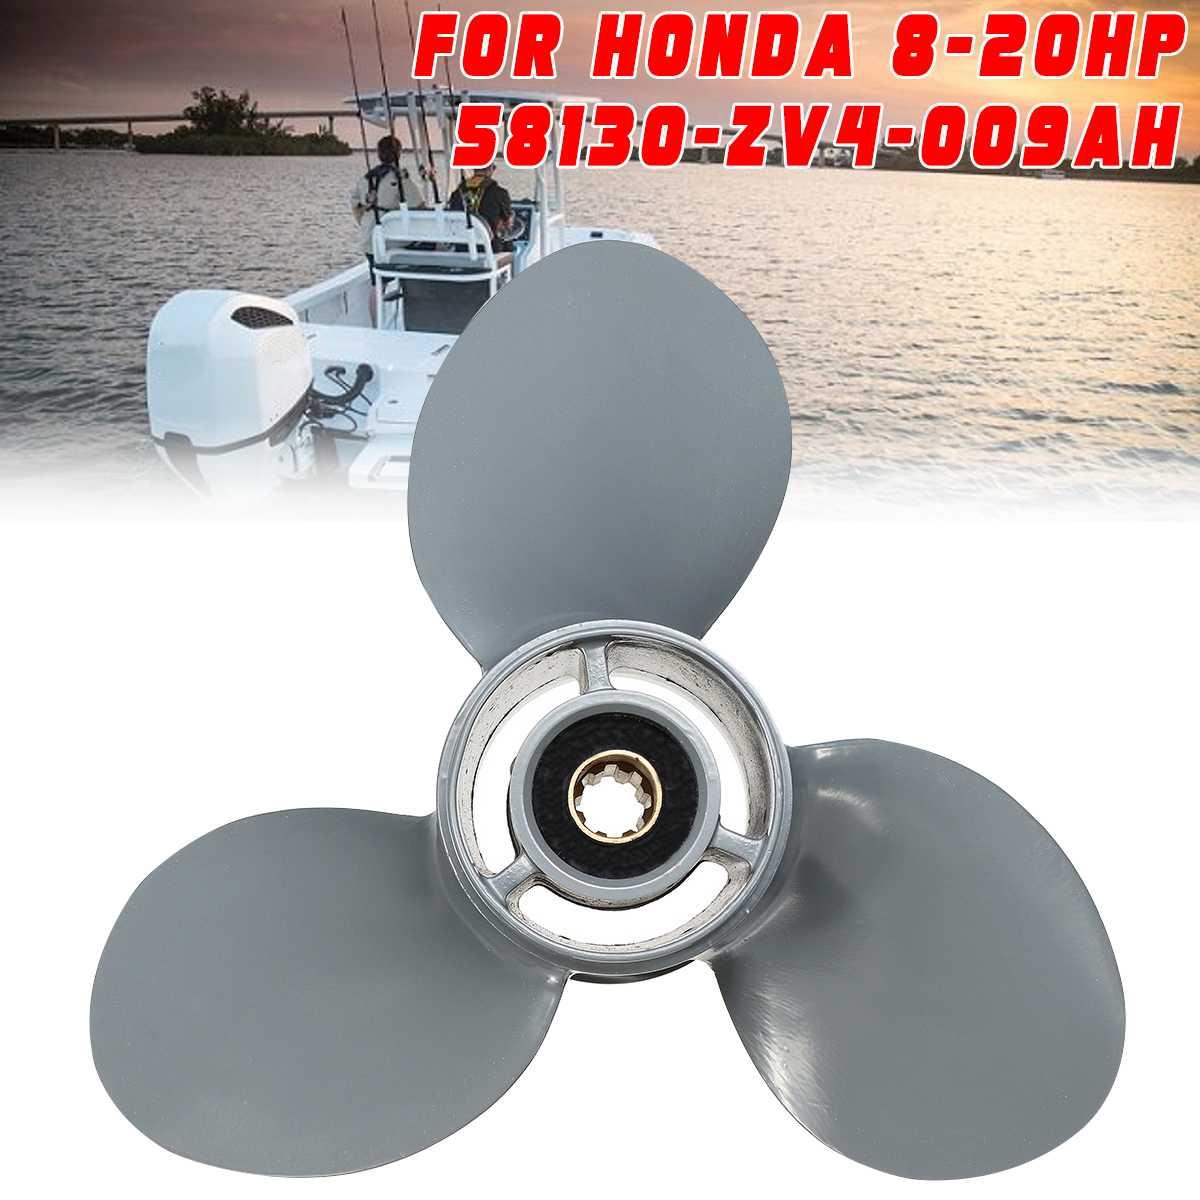 58130-ZV4-009AH 9 1/4 X 9 Propeller For Honda Outboard Engine 8-20HP Aluminum Alloy R Rotation 3 Blades 8 Spline Tooths Gray